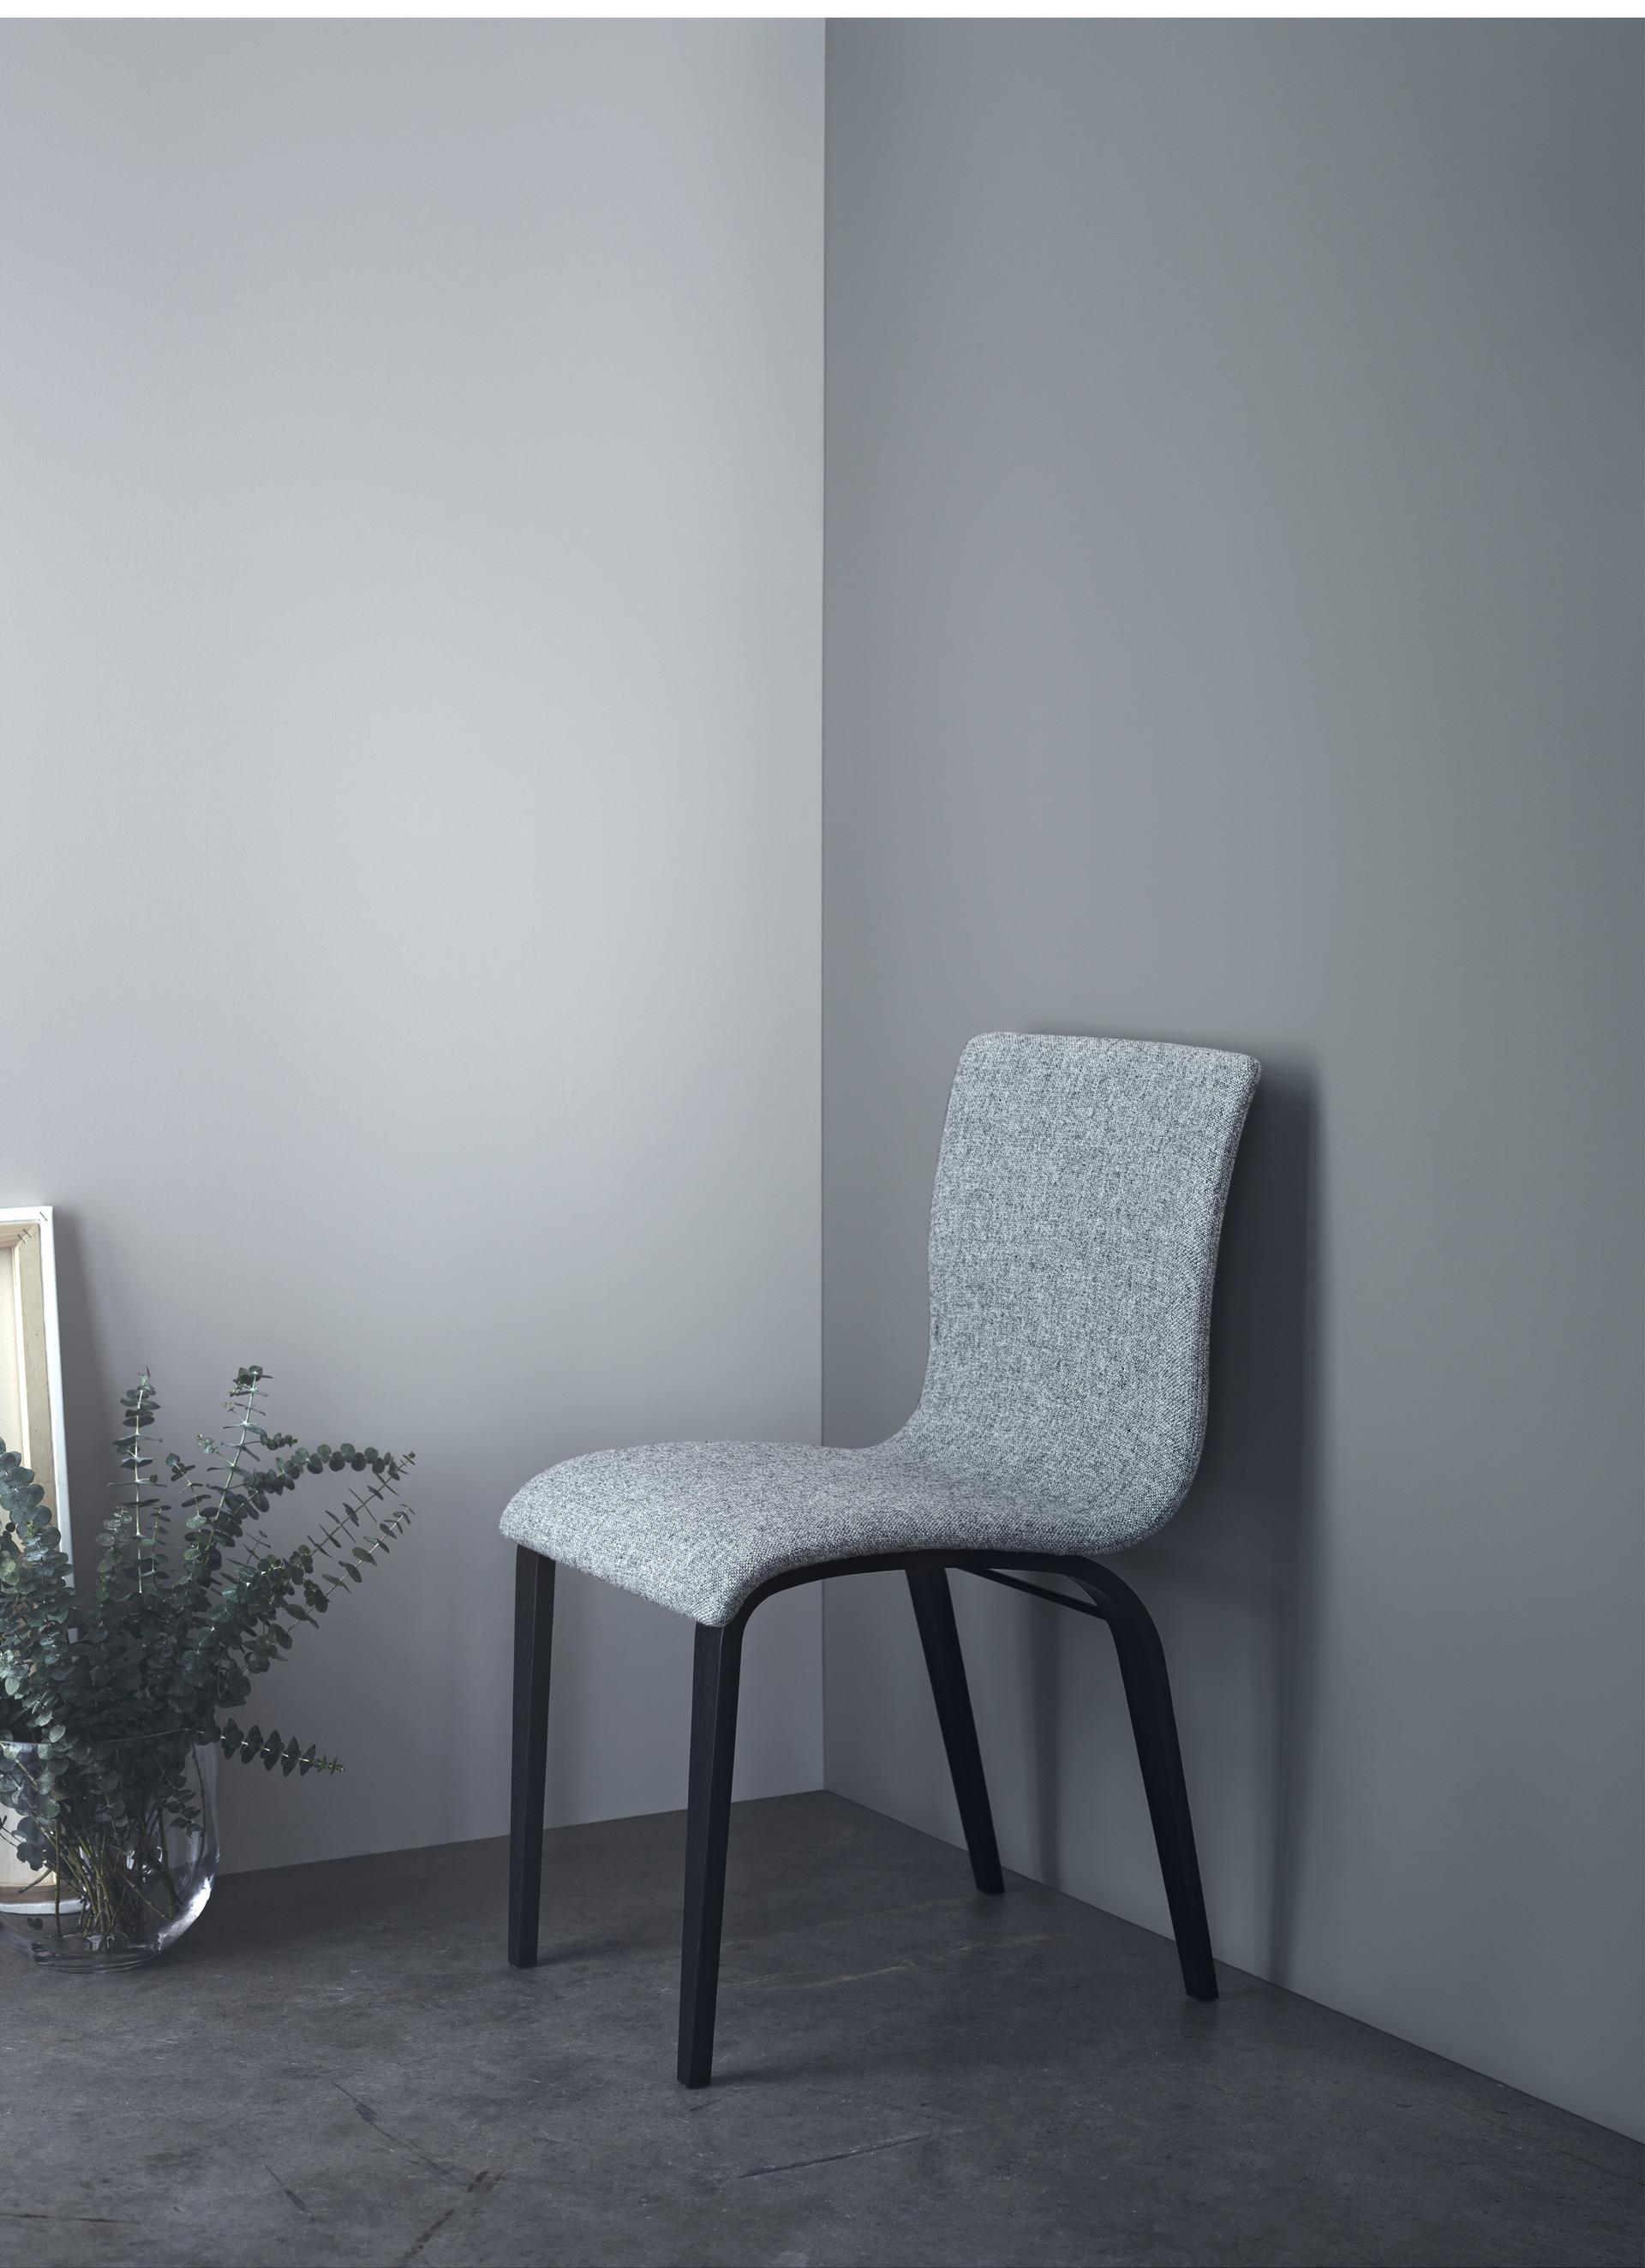 erik_bagger_furniture_Michael_Rygaard6.jpg